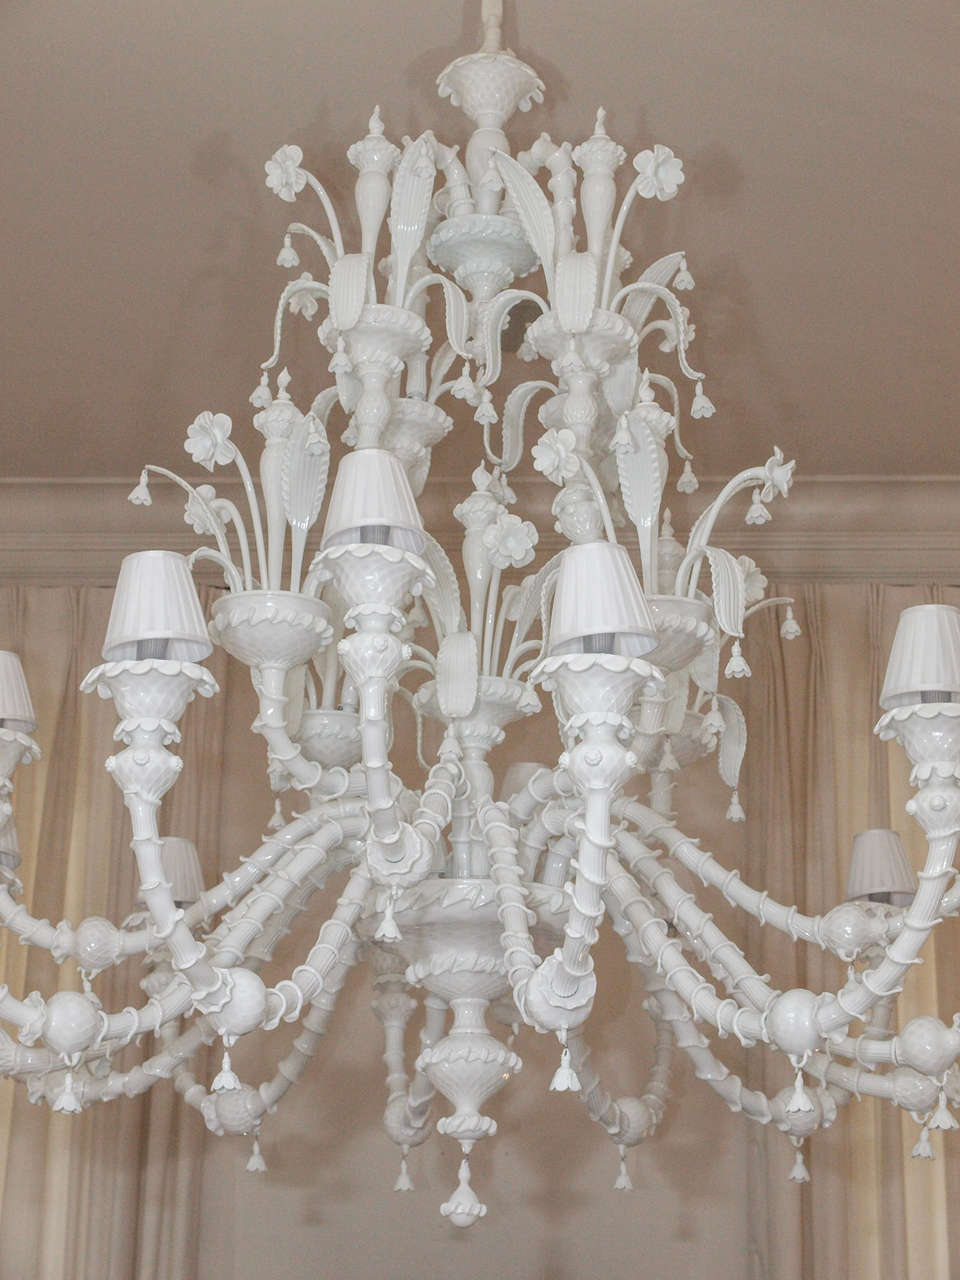 Enormous Milk Glass Murano 16 Light Chandelier at 1stdibs